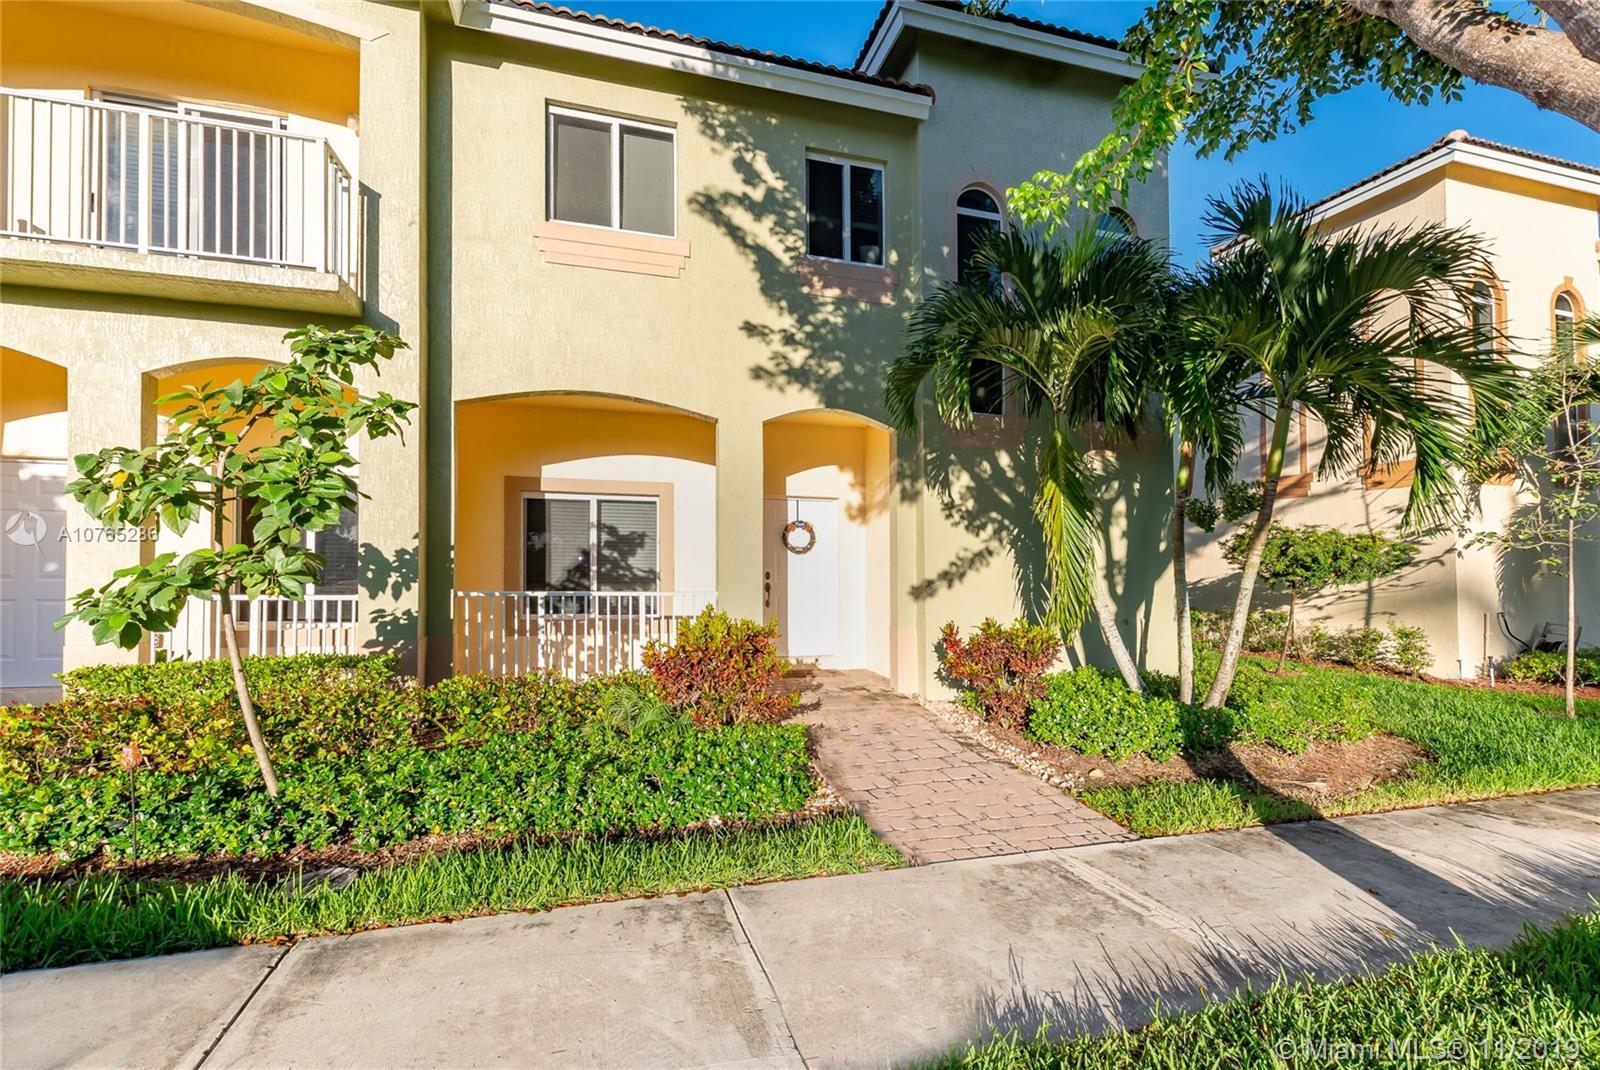 2343 SE 16th Pl #2343, Homestead, FL 33035 - Homestead, FL real estate listing